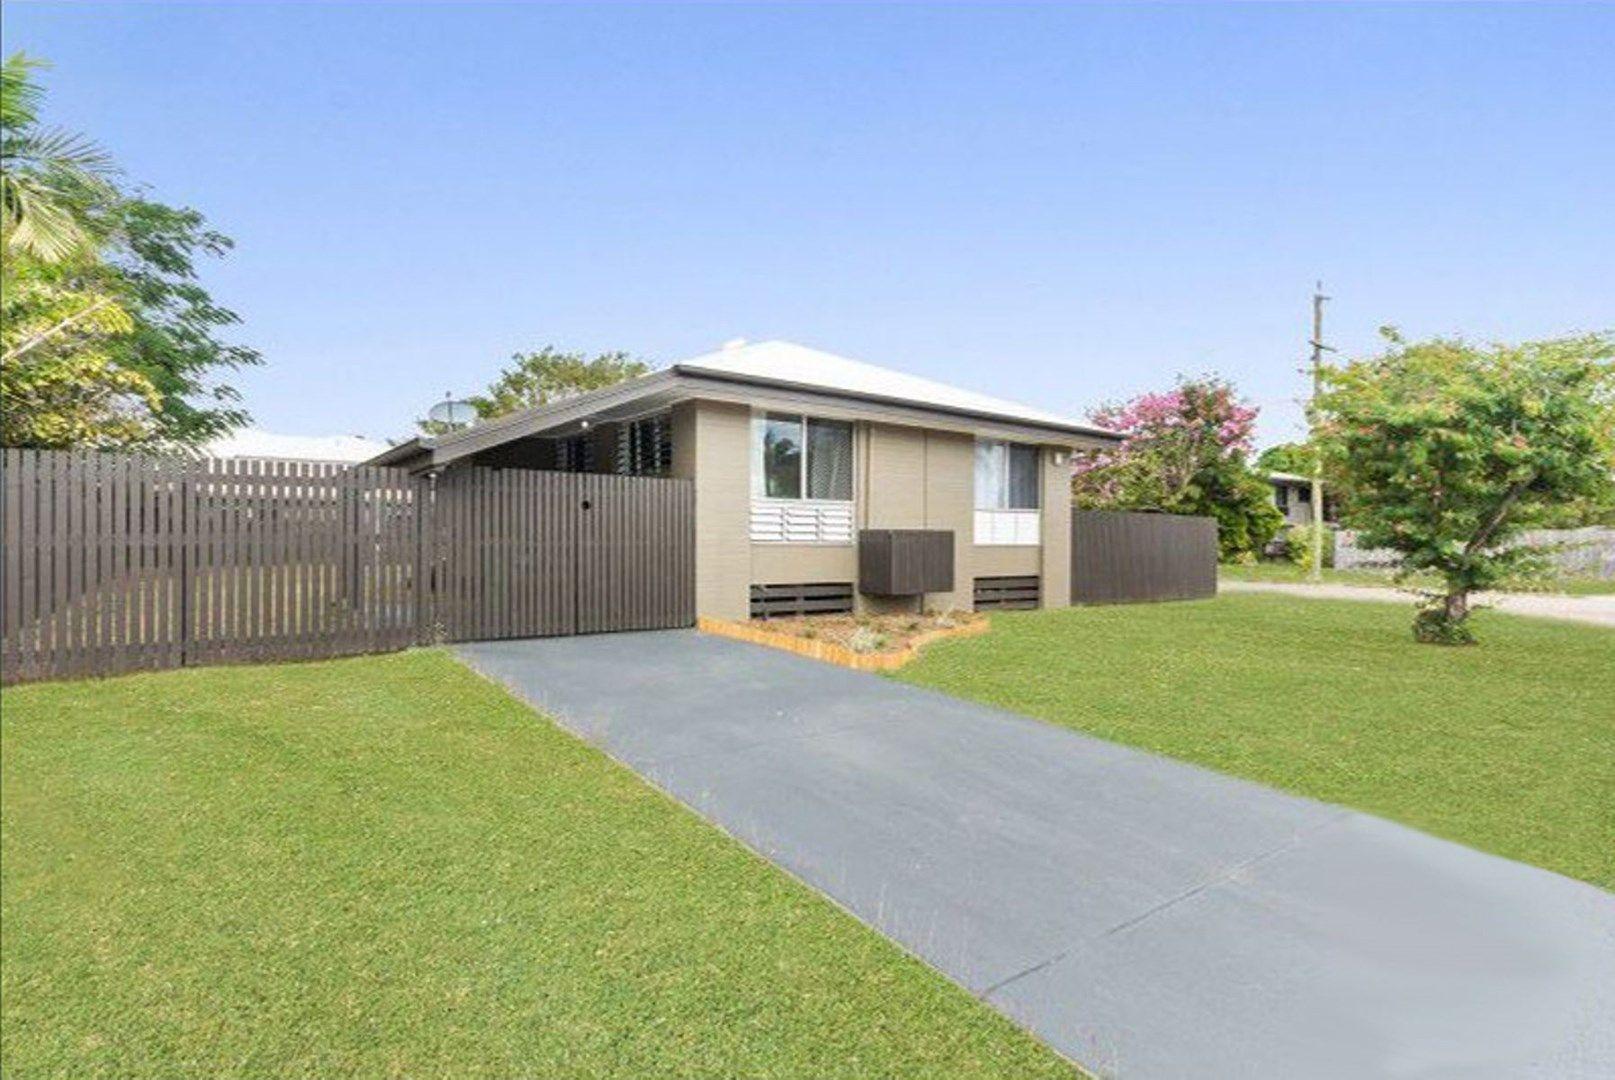 33 Kelso Street, Aitkenvale QLD 4814, Image 0